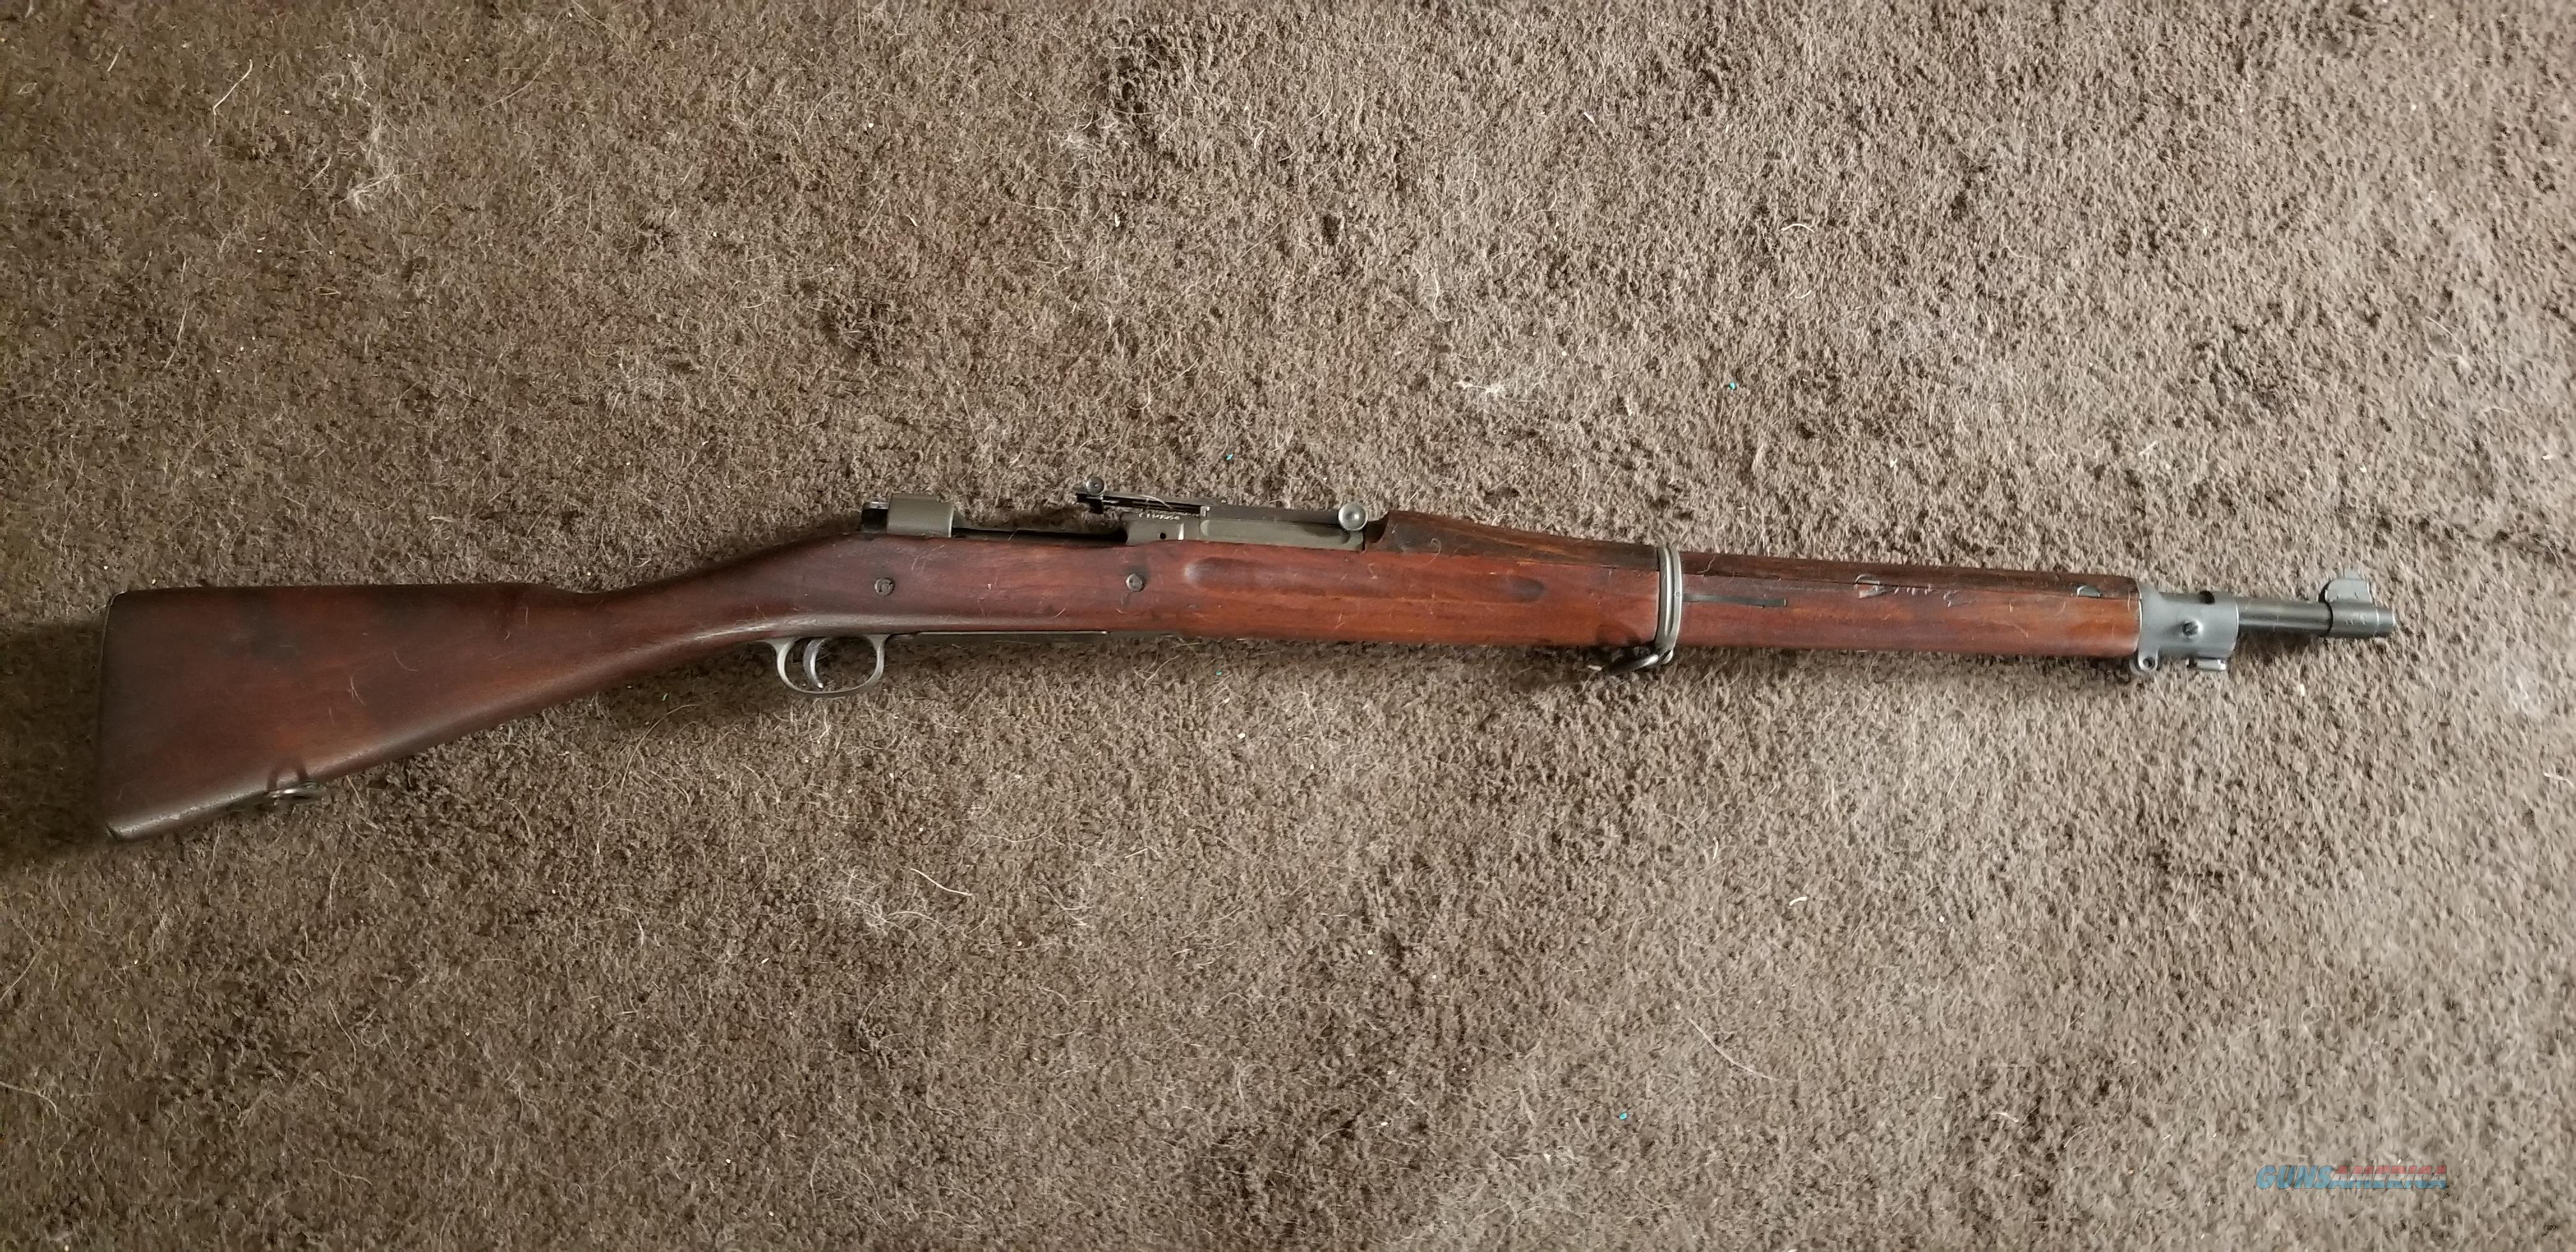 Rock Island Springfield Model 1903  Guns > Rifles > Military Misc. Rifles US > 1903 Springfield/Variants